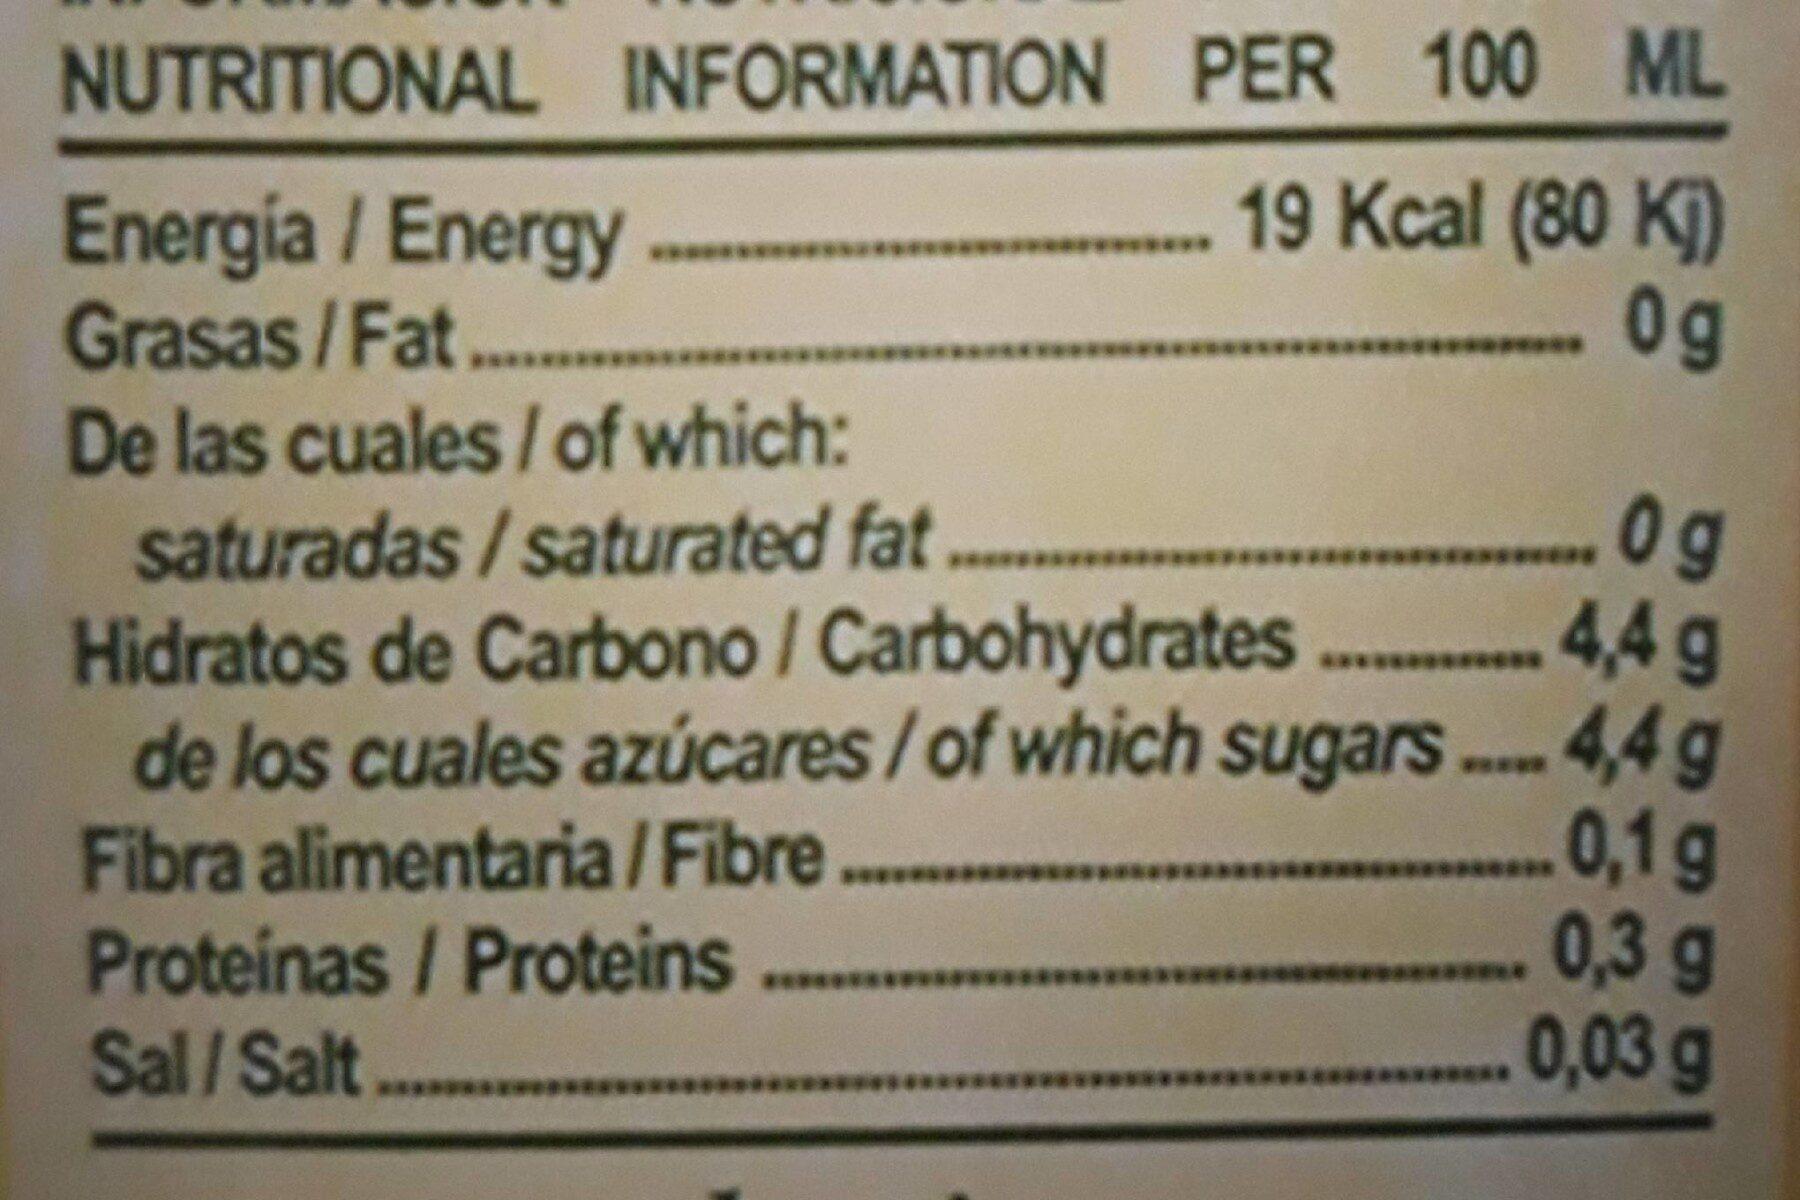 Néctar de naranja - Informations nutritionnelles - fr